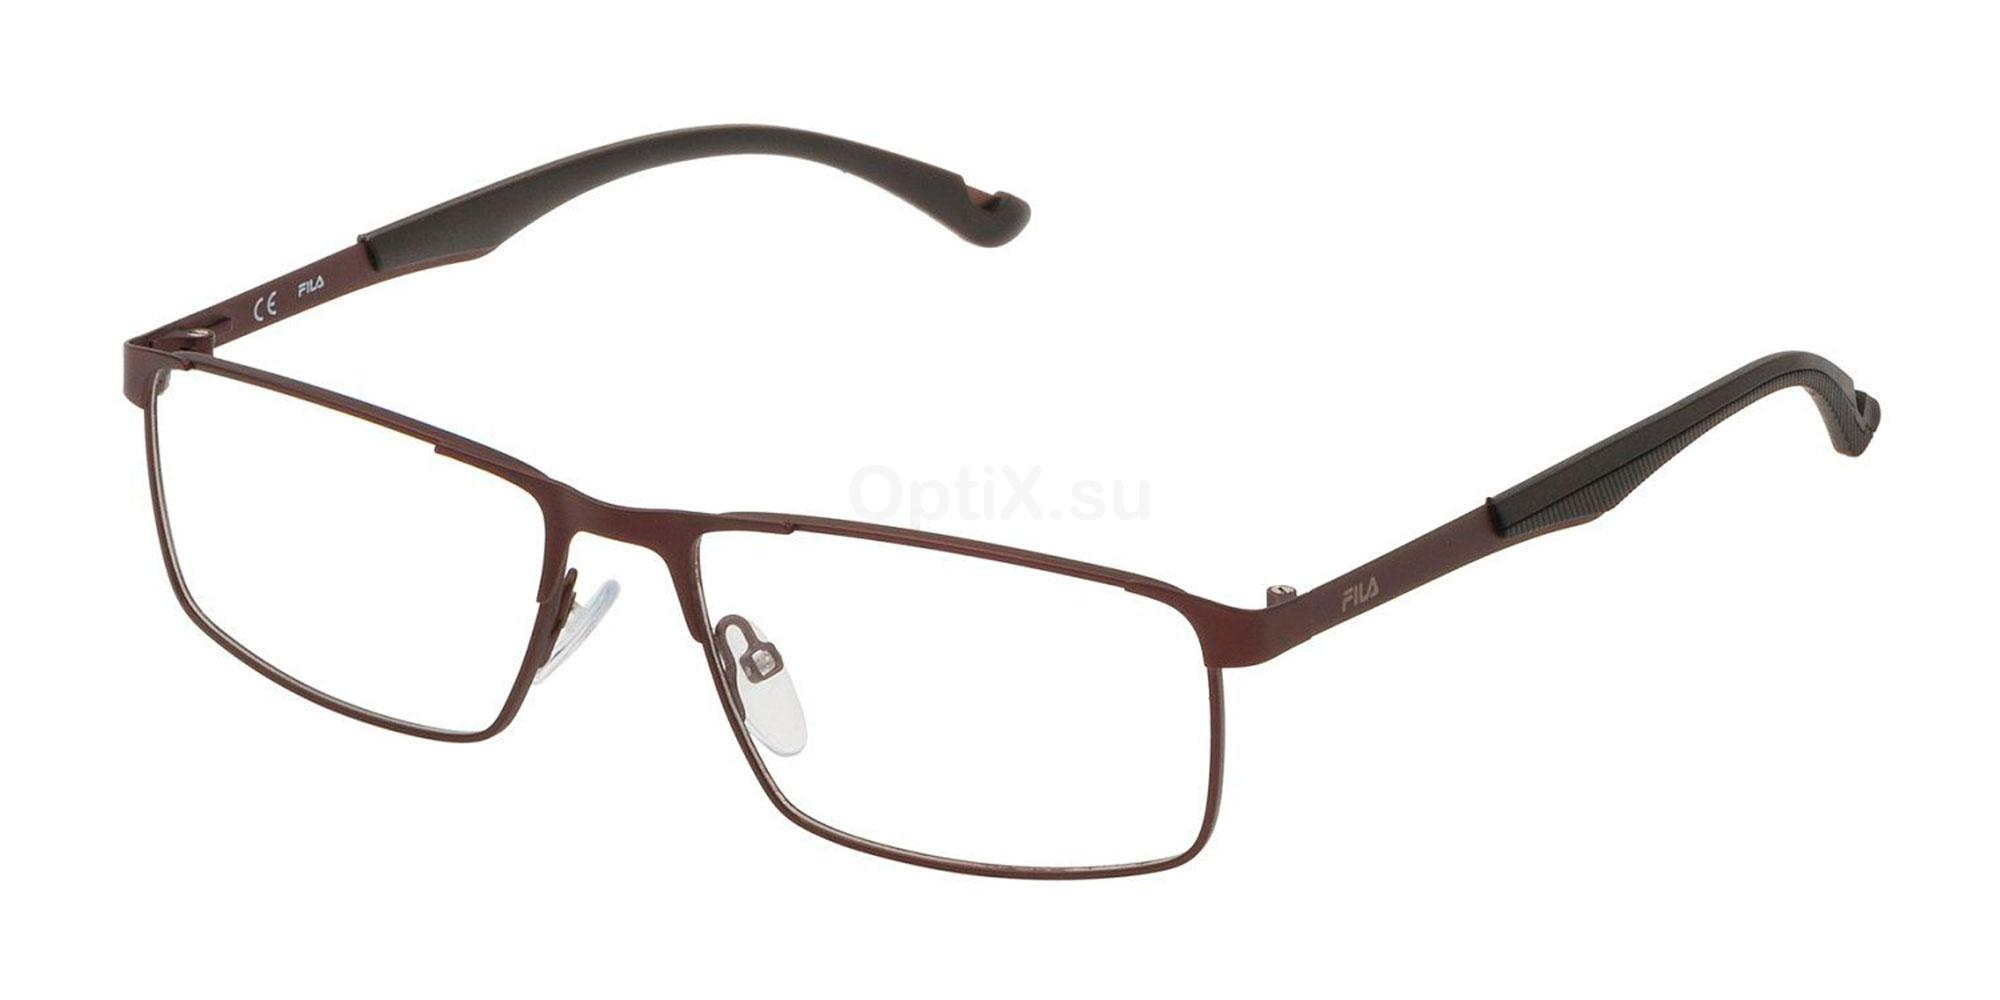 08C4 VF9918 Glasses, Fila